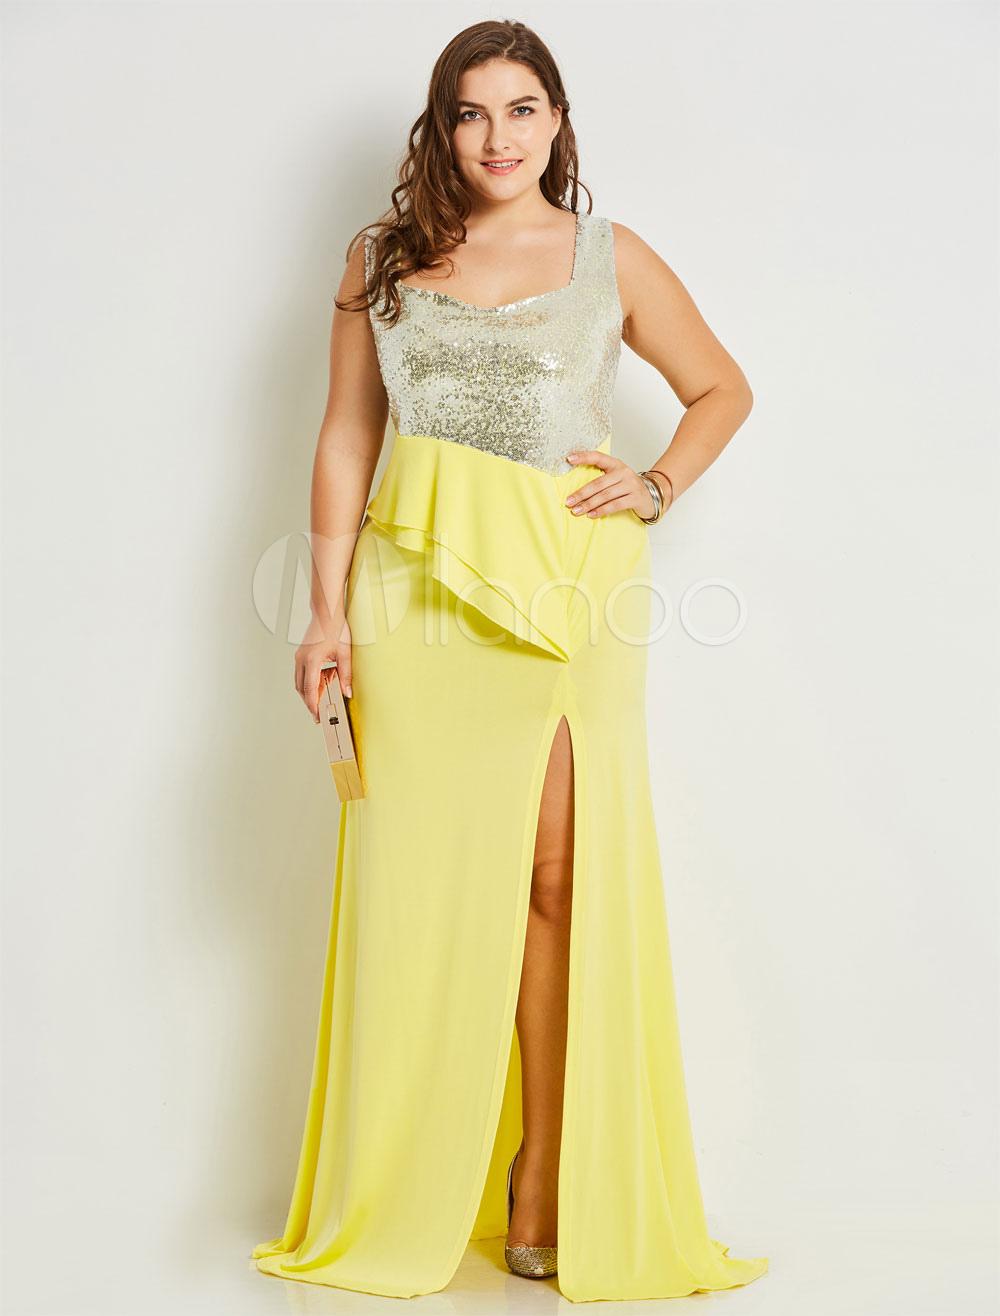 Dresses Plus Size Women Yellow Sleeveless Sequins Peplum Asymmetrical Split Maxi  Dress-No.1 ... bbfdd9144